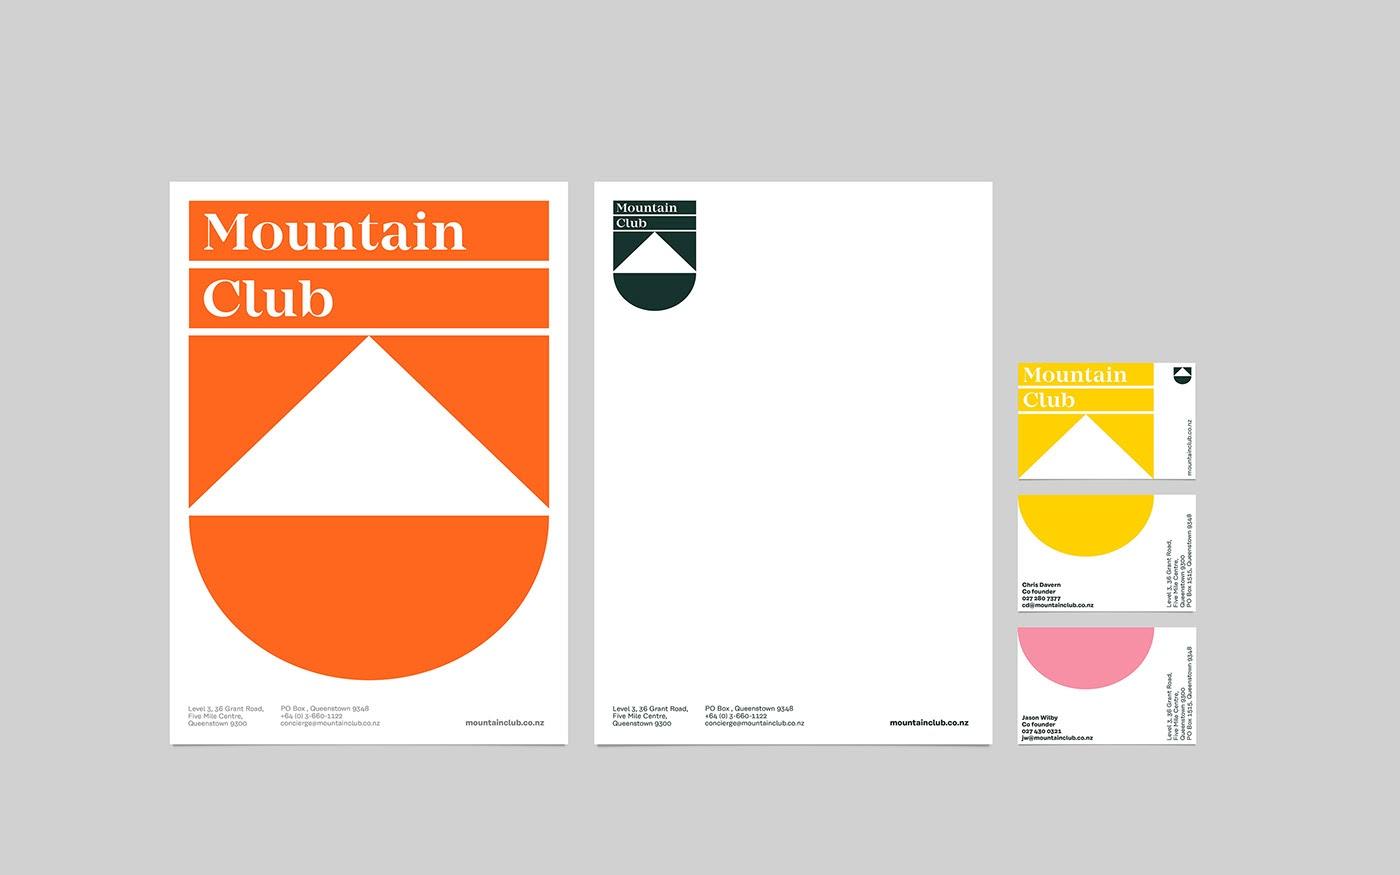 Mountain Club度假酒店品牌识别设计